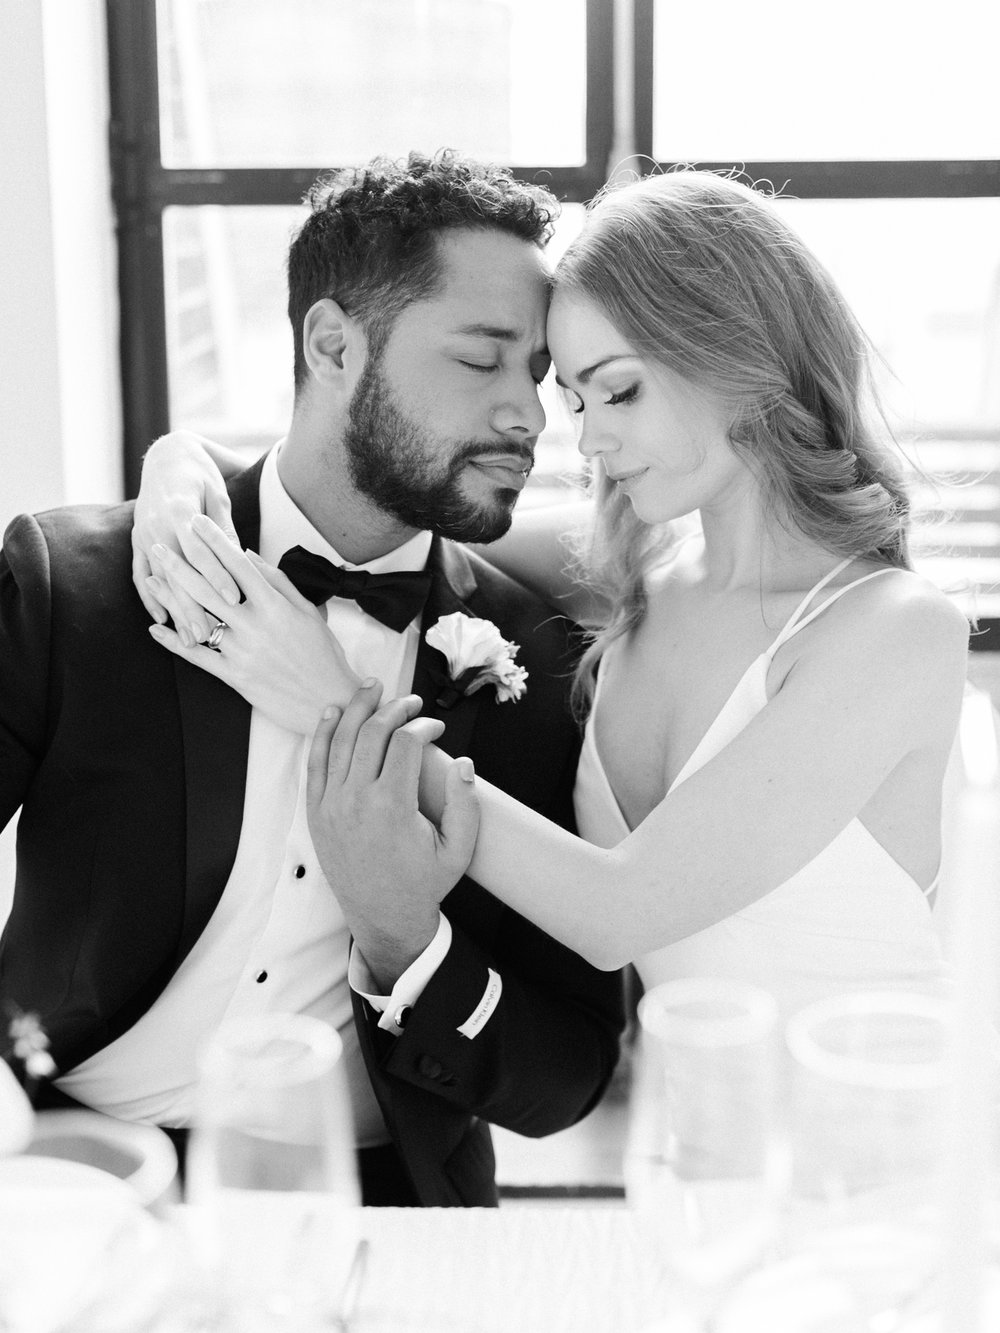 asher-gardner-photography-bryant-park-wedding-00284.jpg